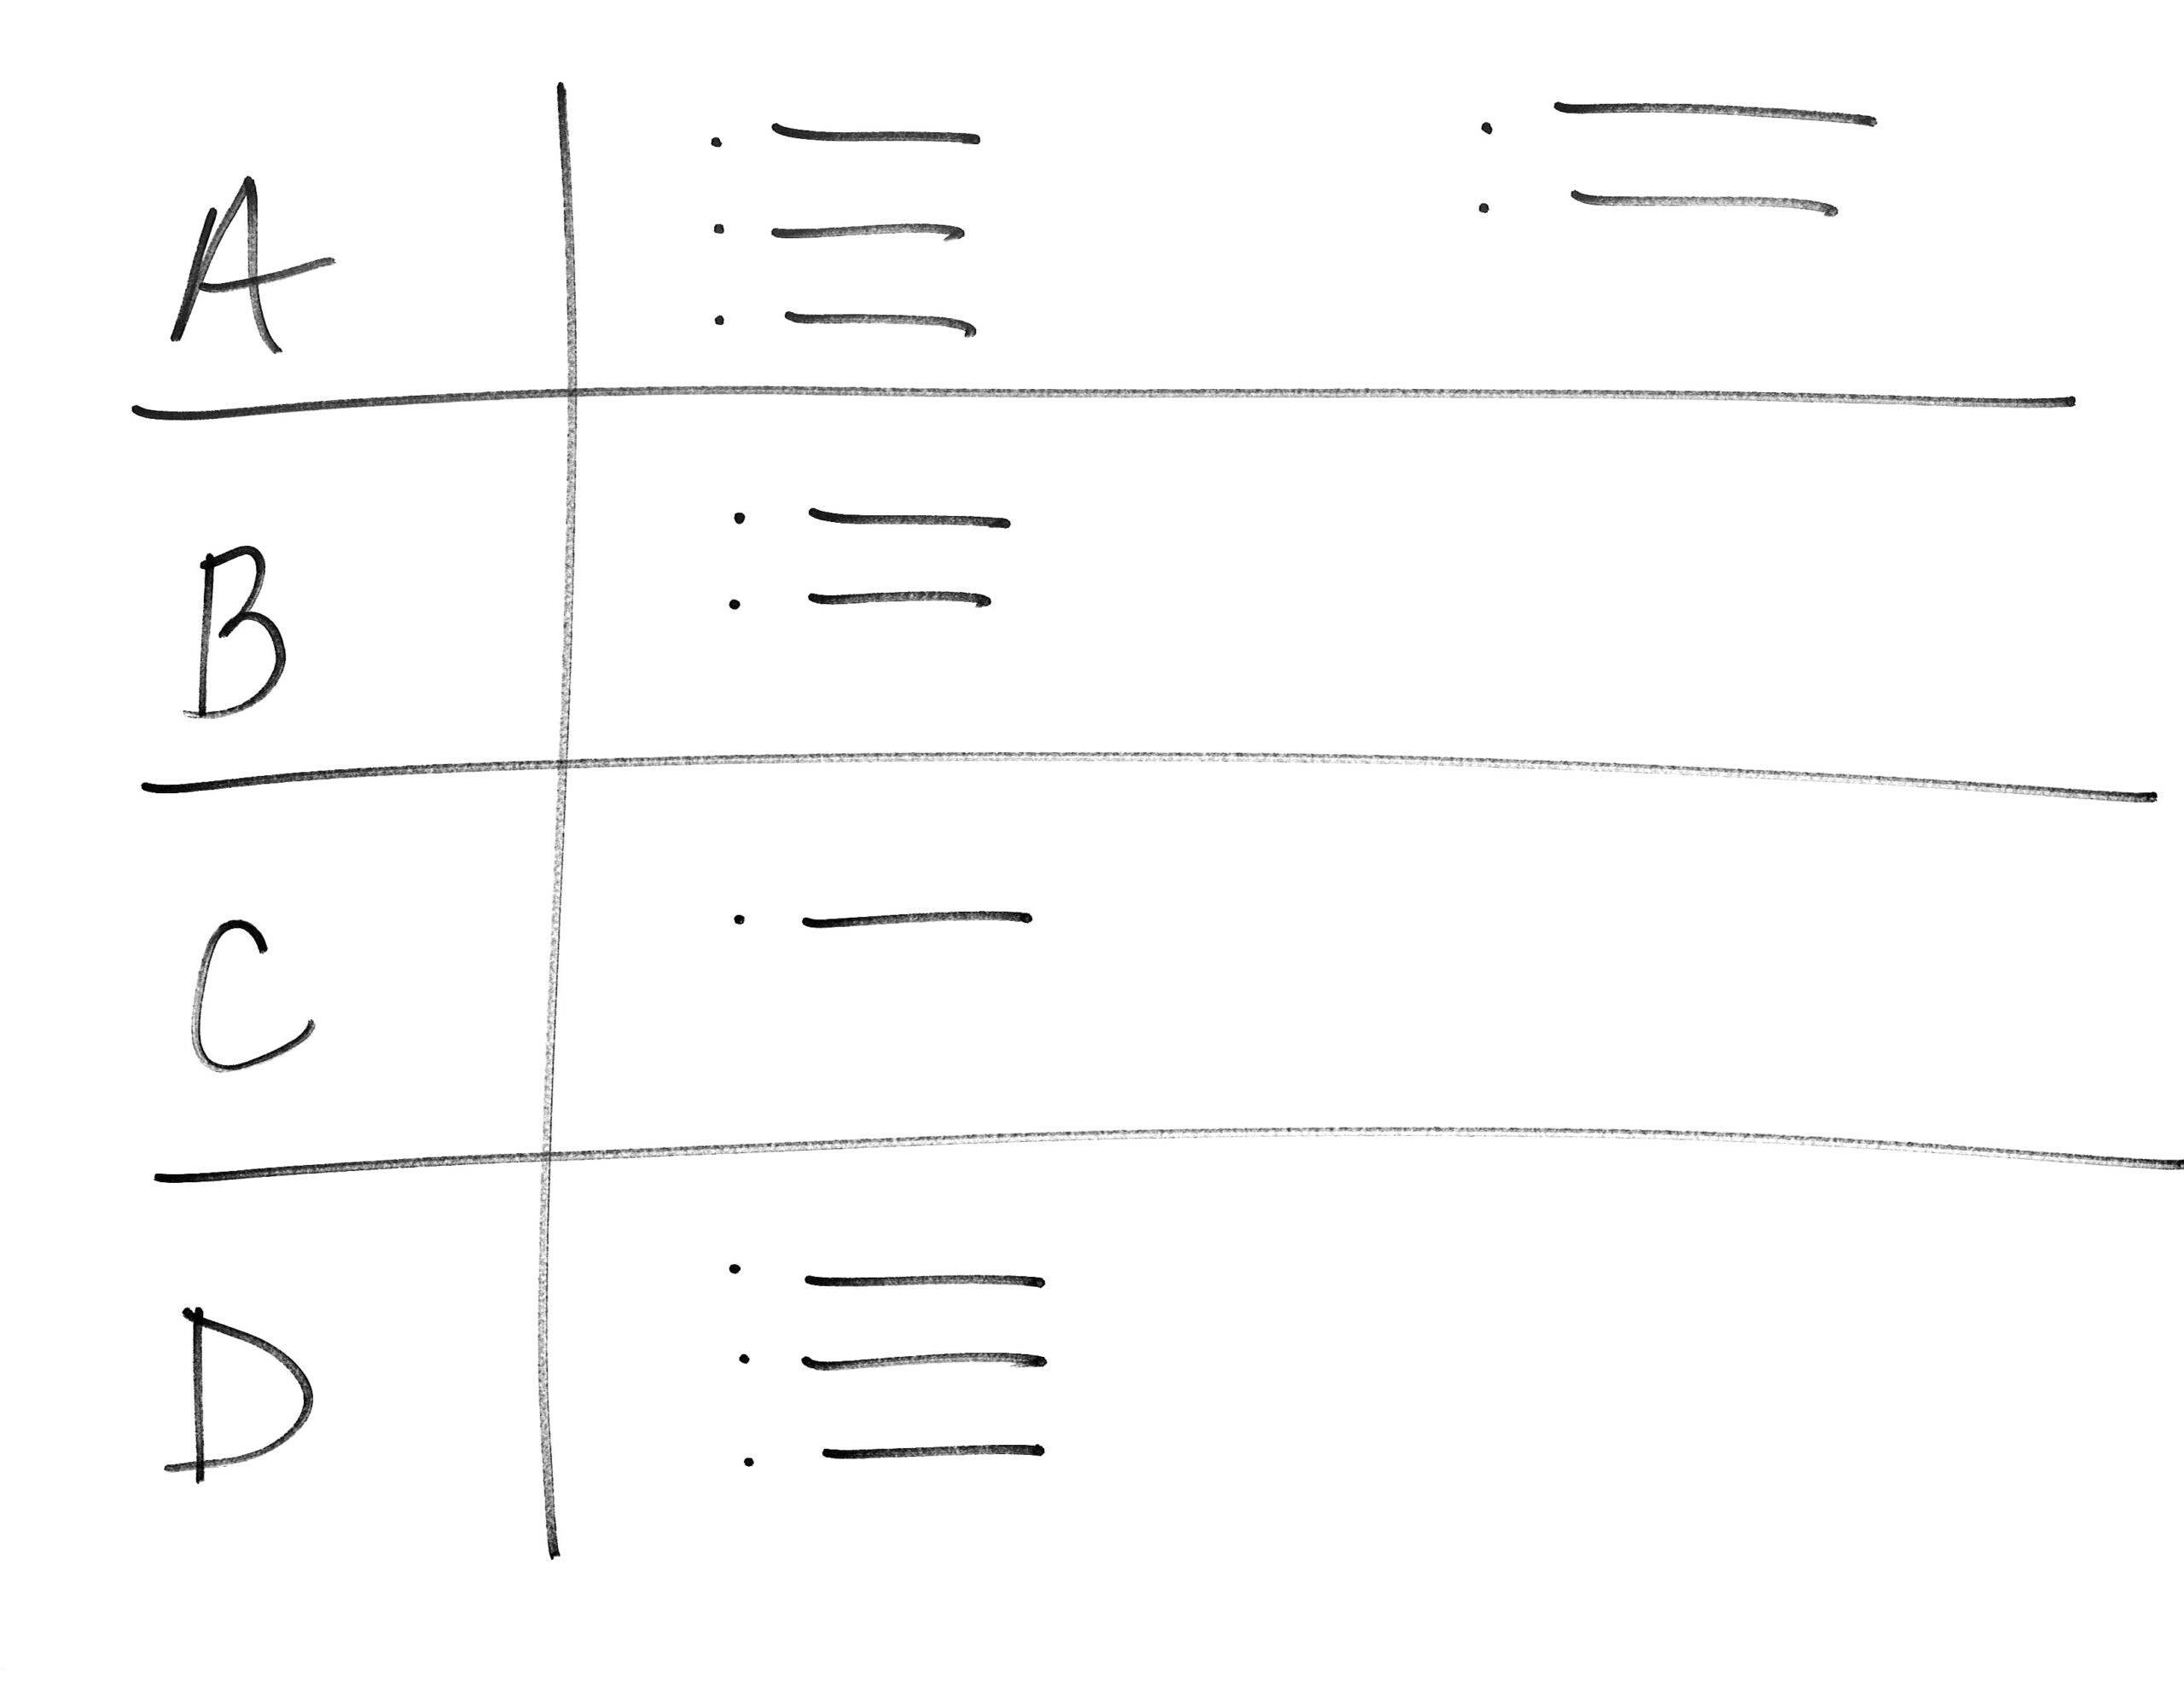 Organize Sources - Step 2 - Model